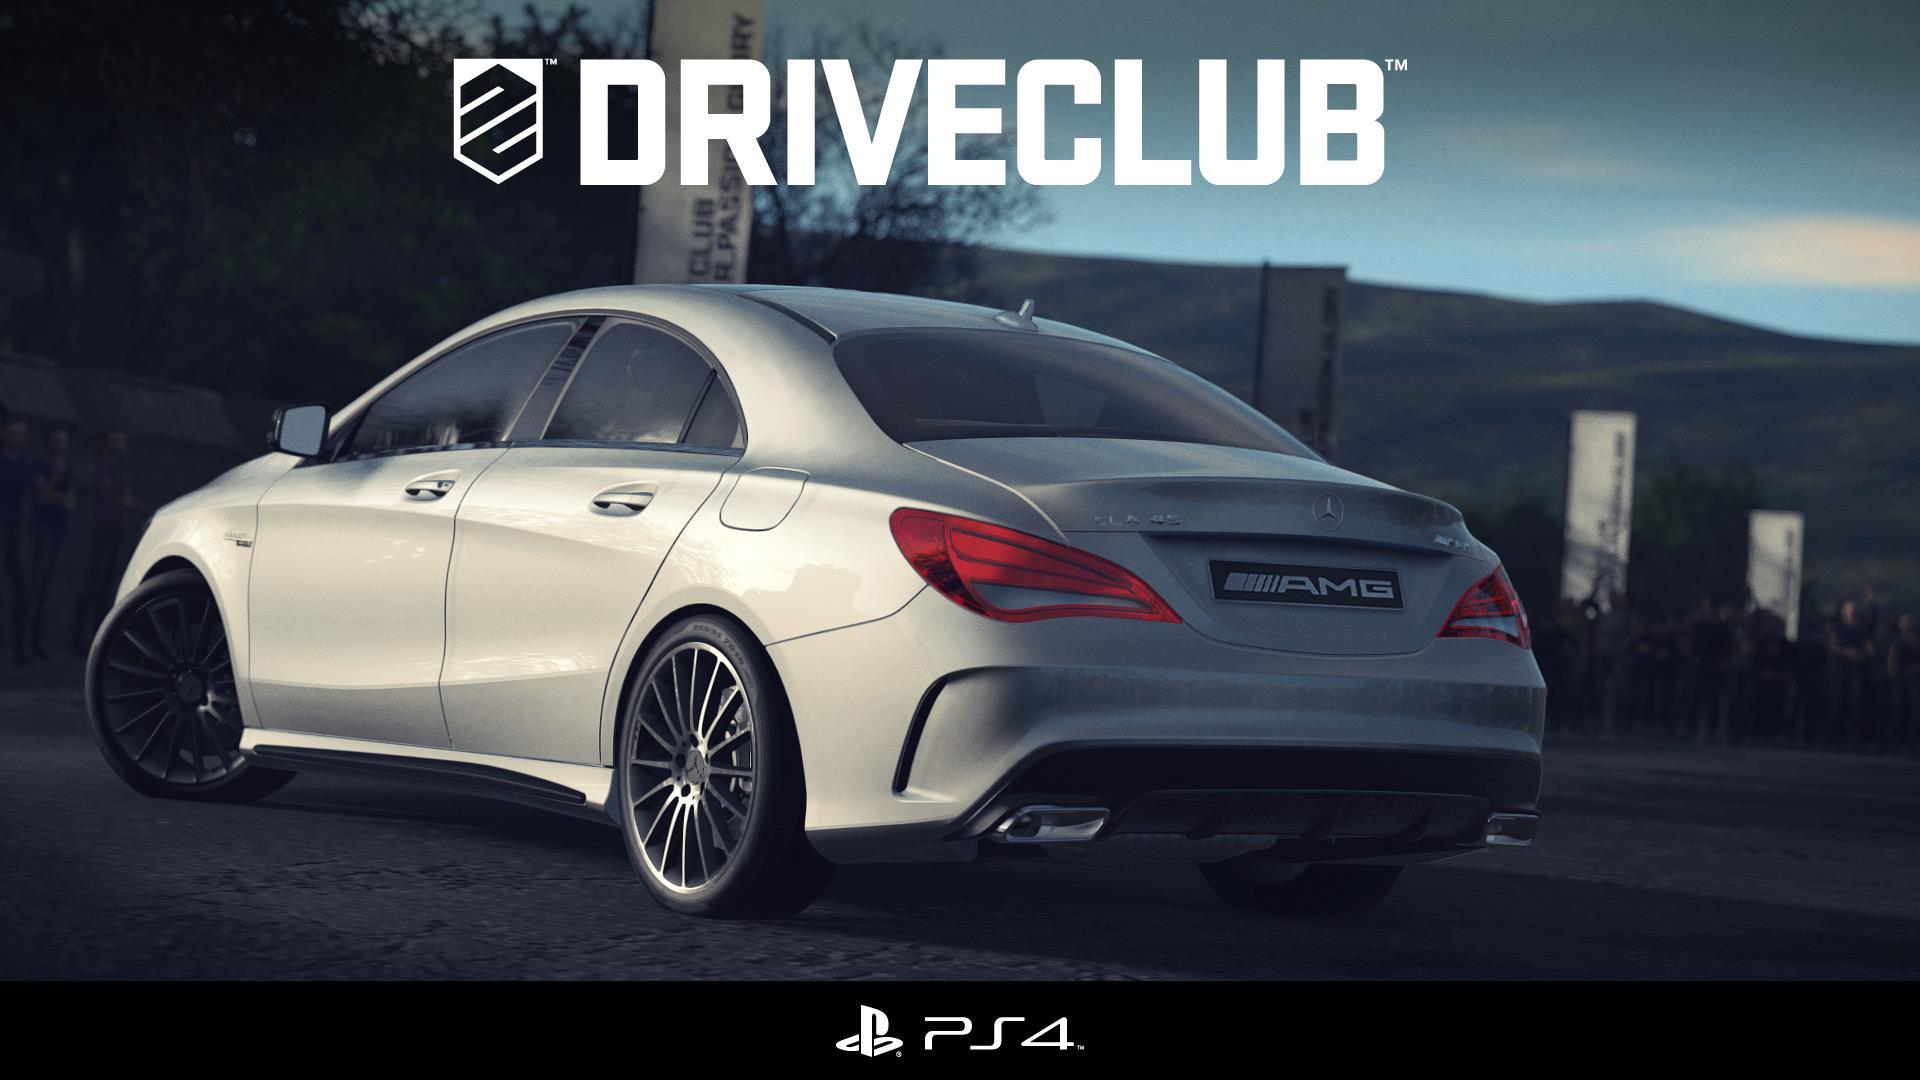 Drive_Club_Mercedes_CLA_presentation.jpg